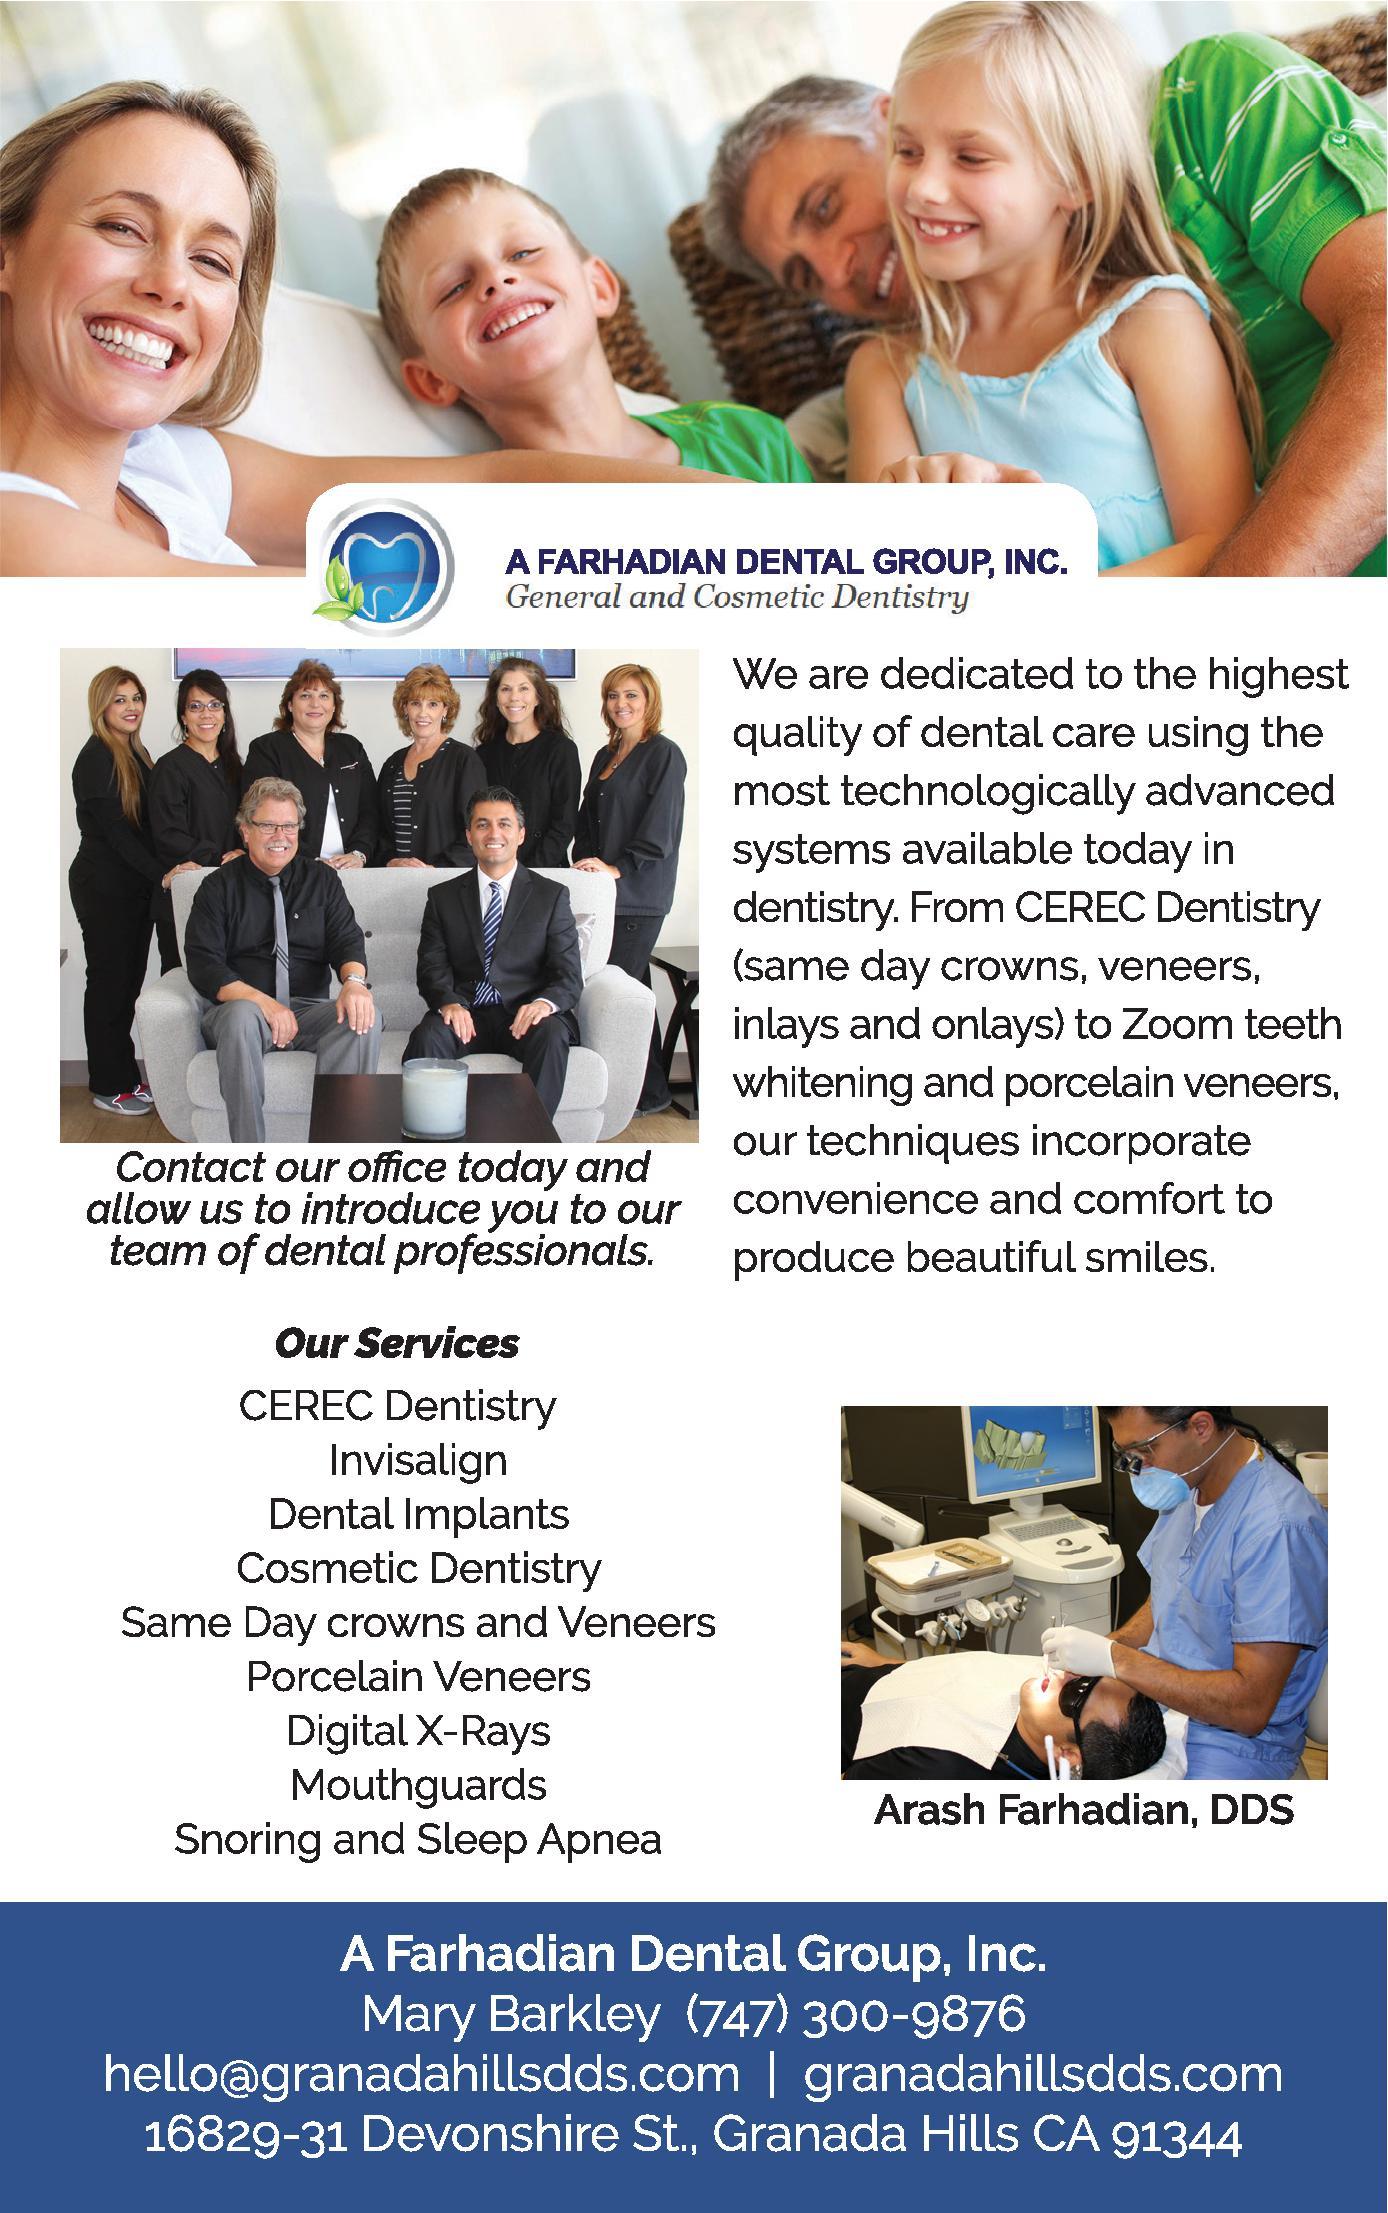 A Farhadian Dental Group, Inc.